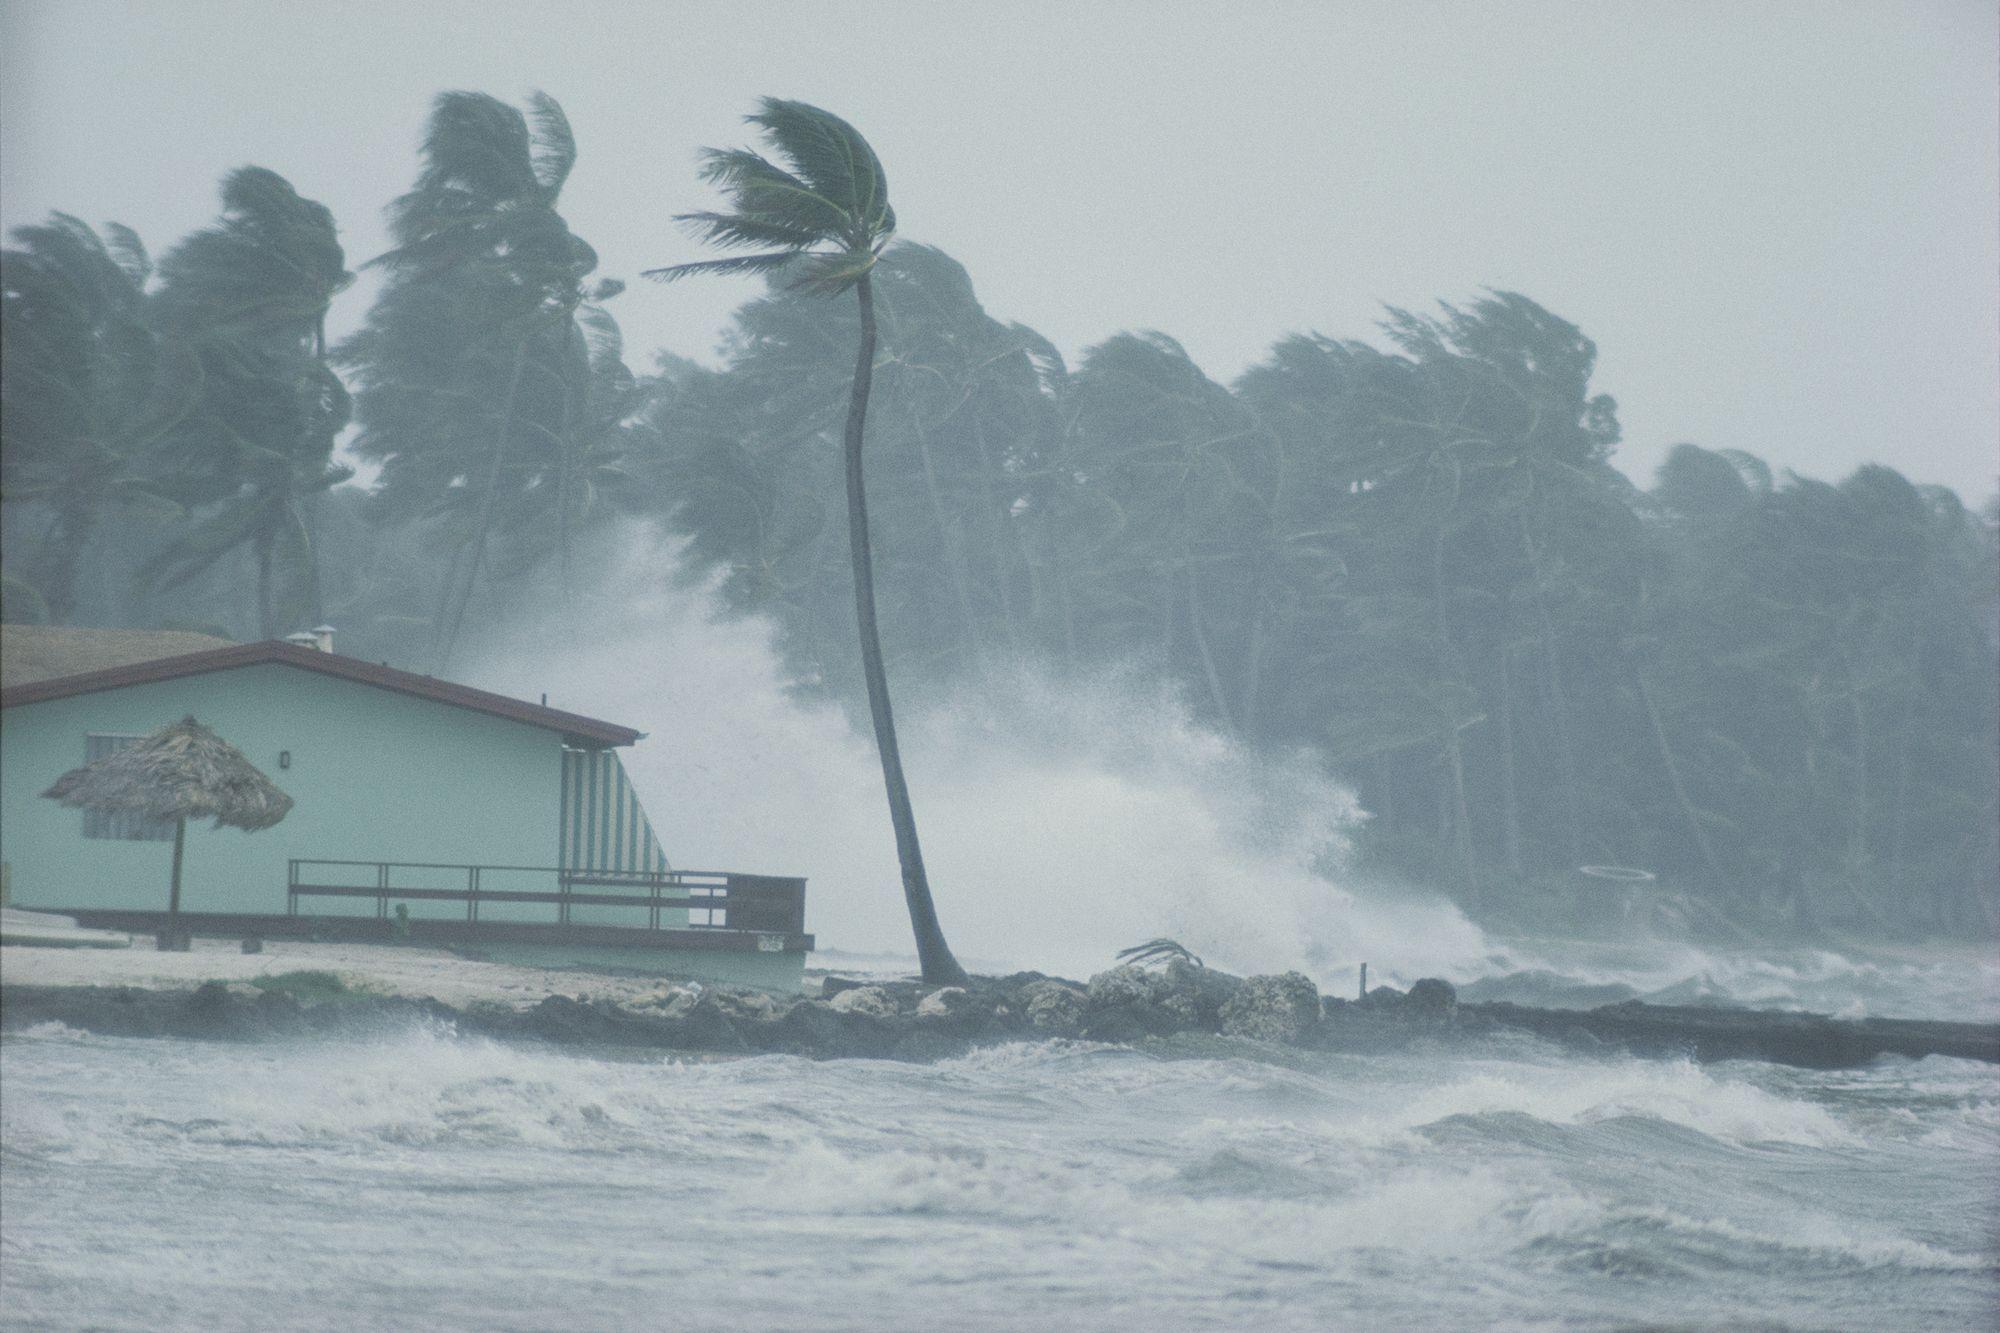 1-es kategóriájú hurrikánná erősödhet a Ianos (Cassilda/Udine) medikán Görögország partjainál! 7